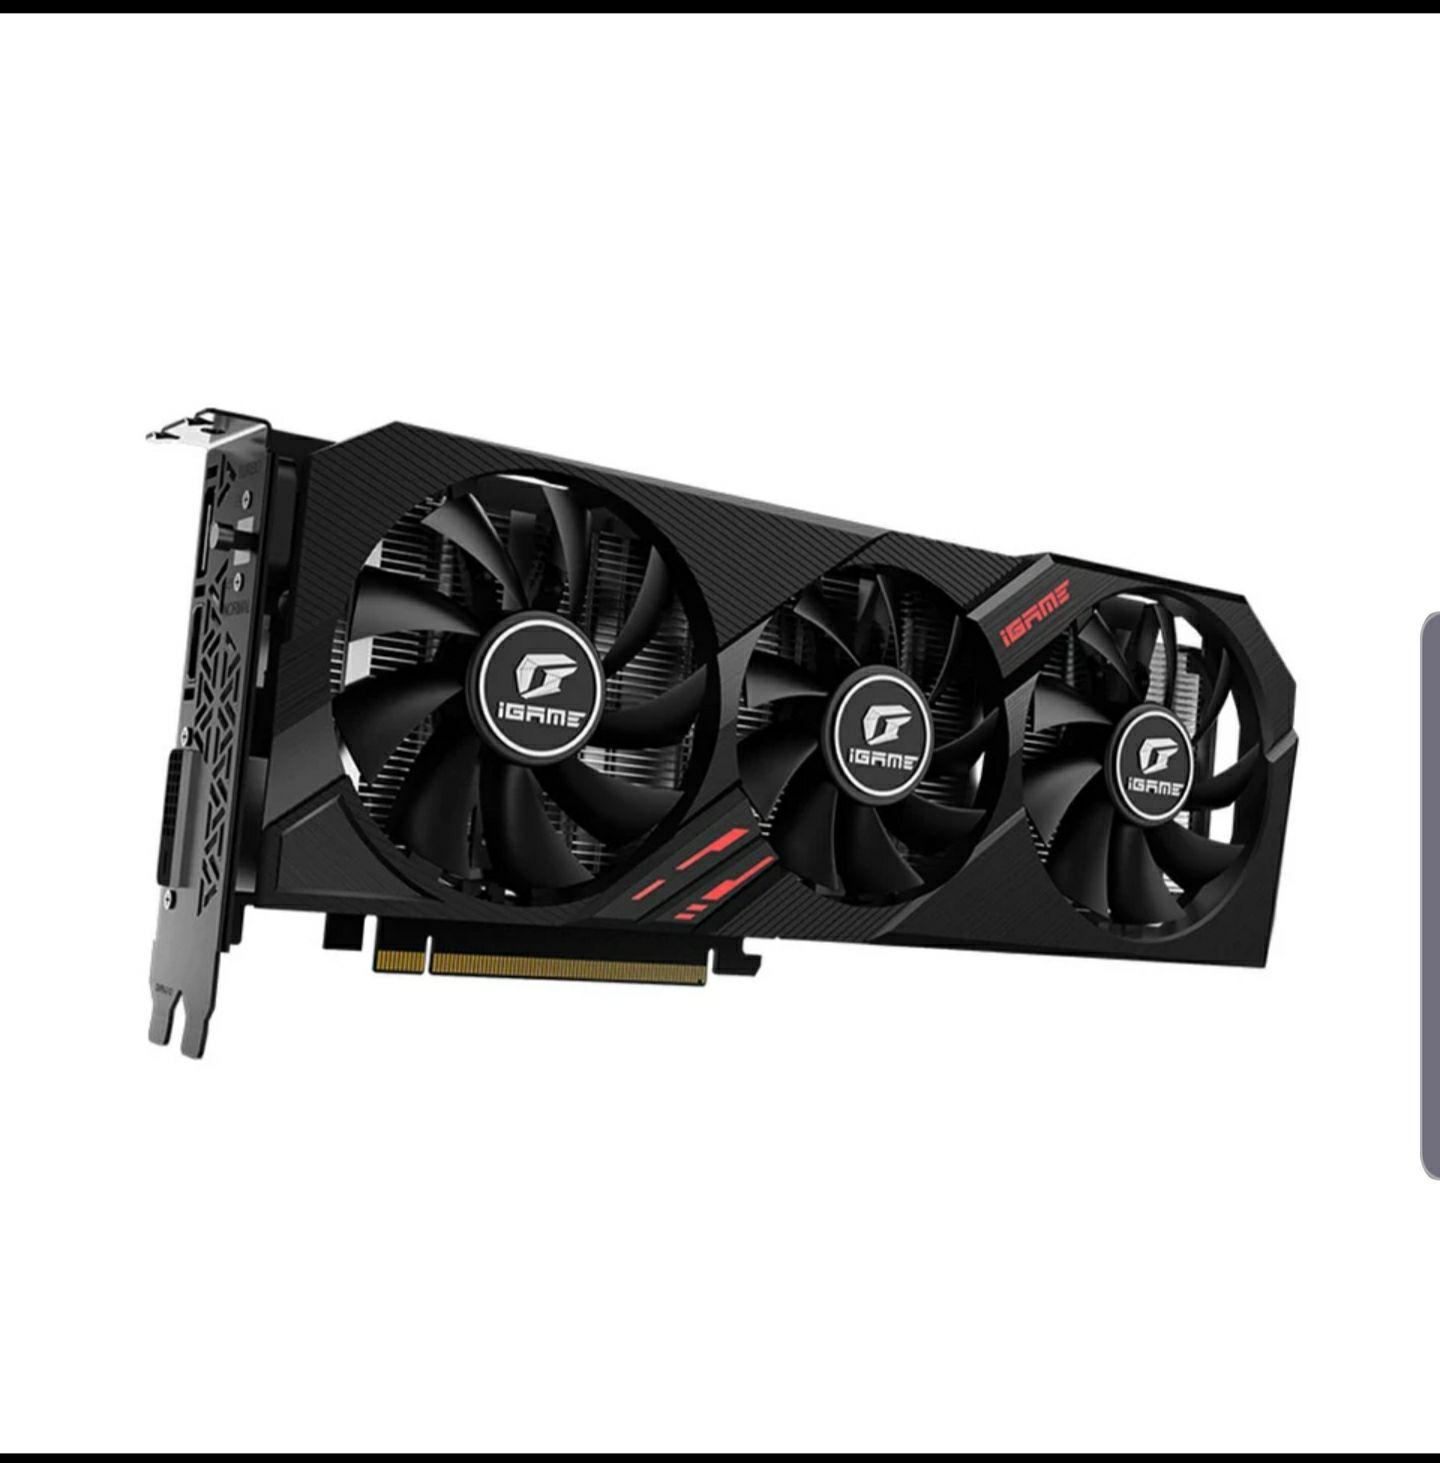 GeForce GTX 1660 Ultra 6G GDDR5